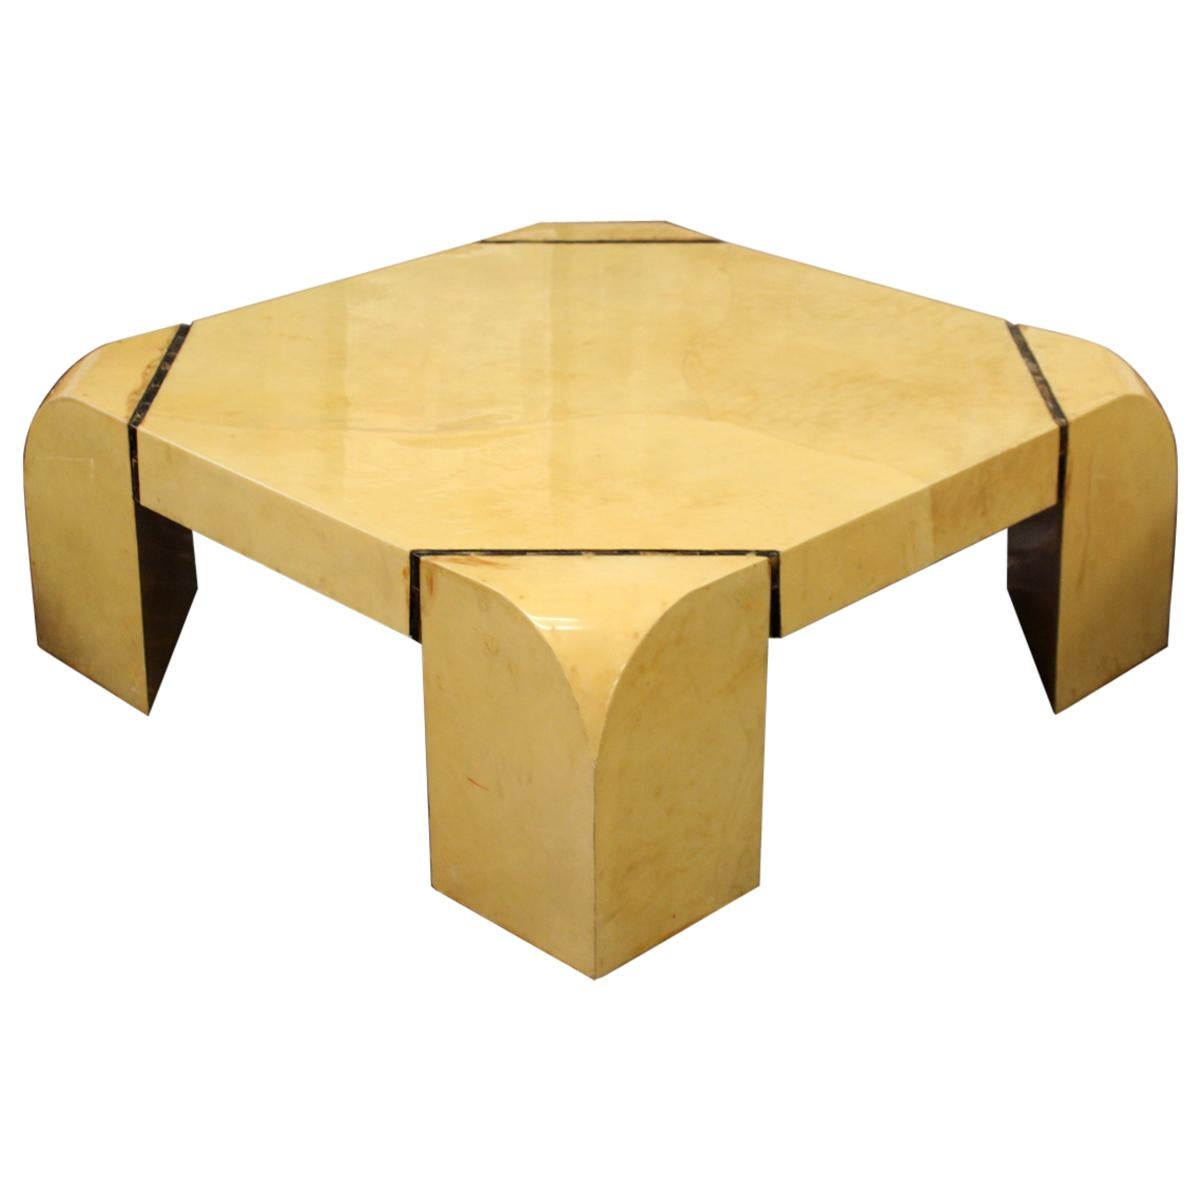 Mid-Century Modern Square Goatskin Coffee Table Attr. to Karl Springer 1970s